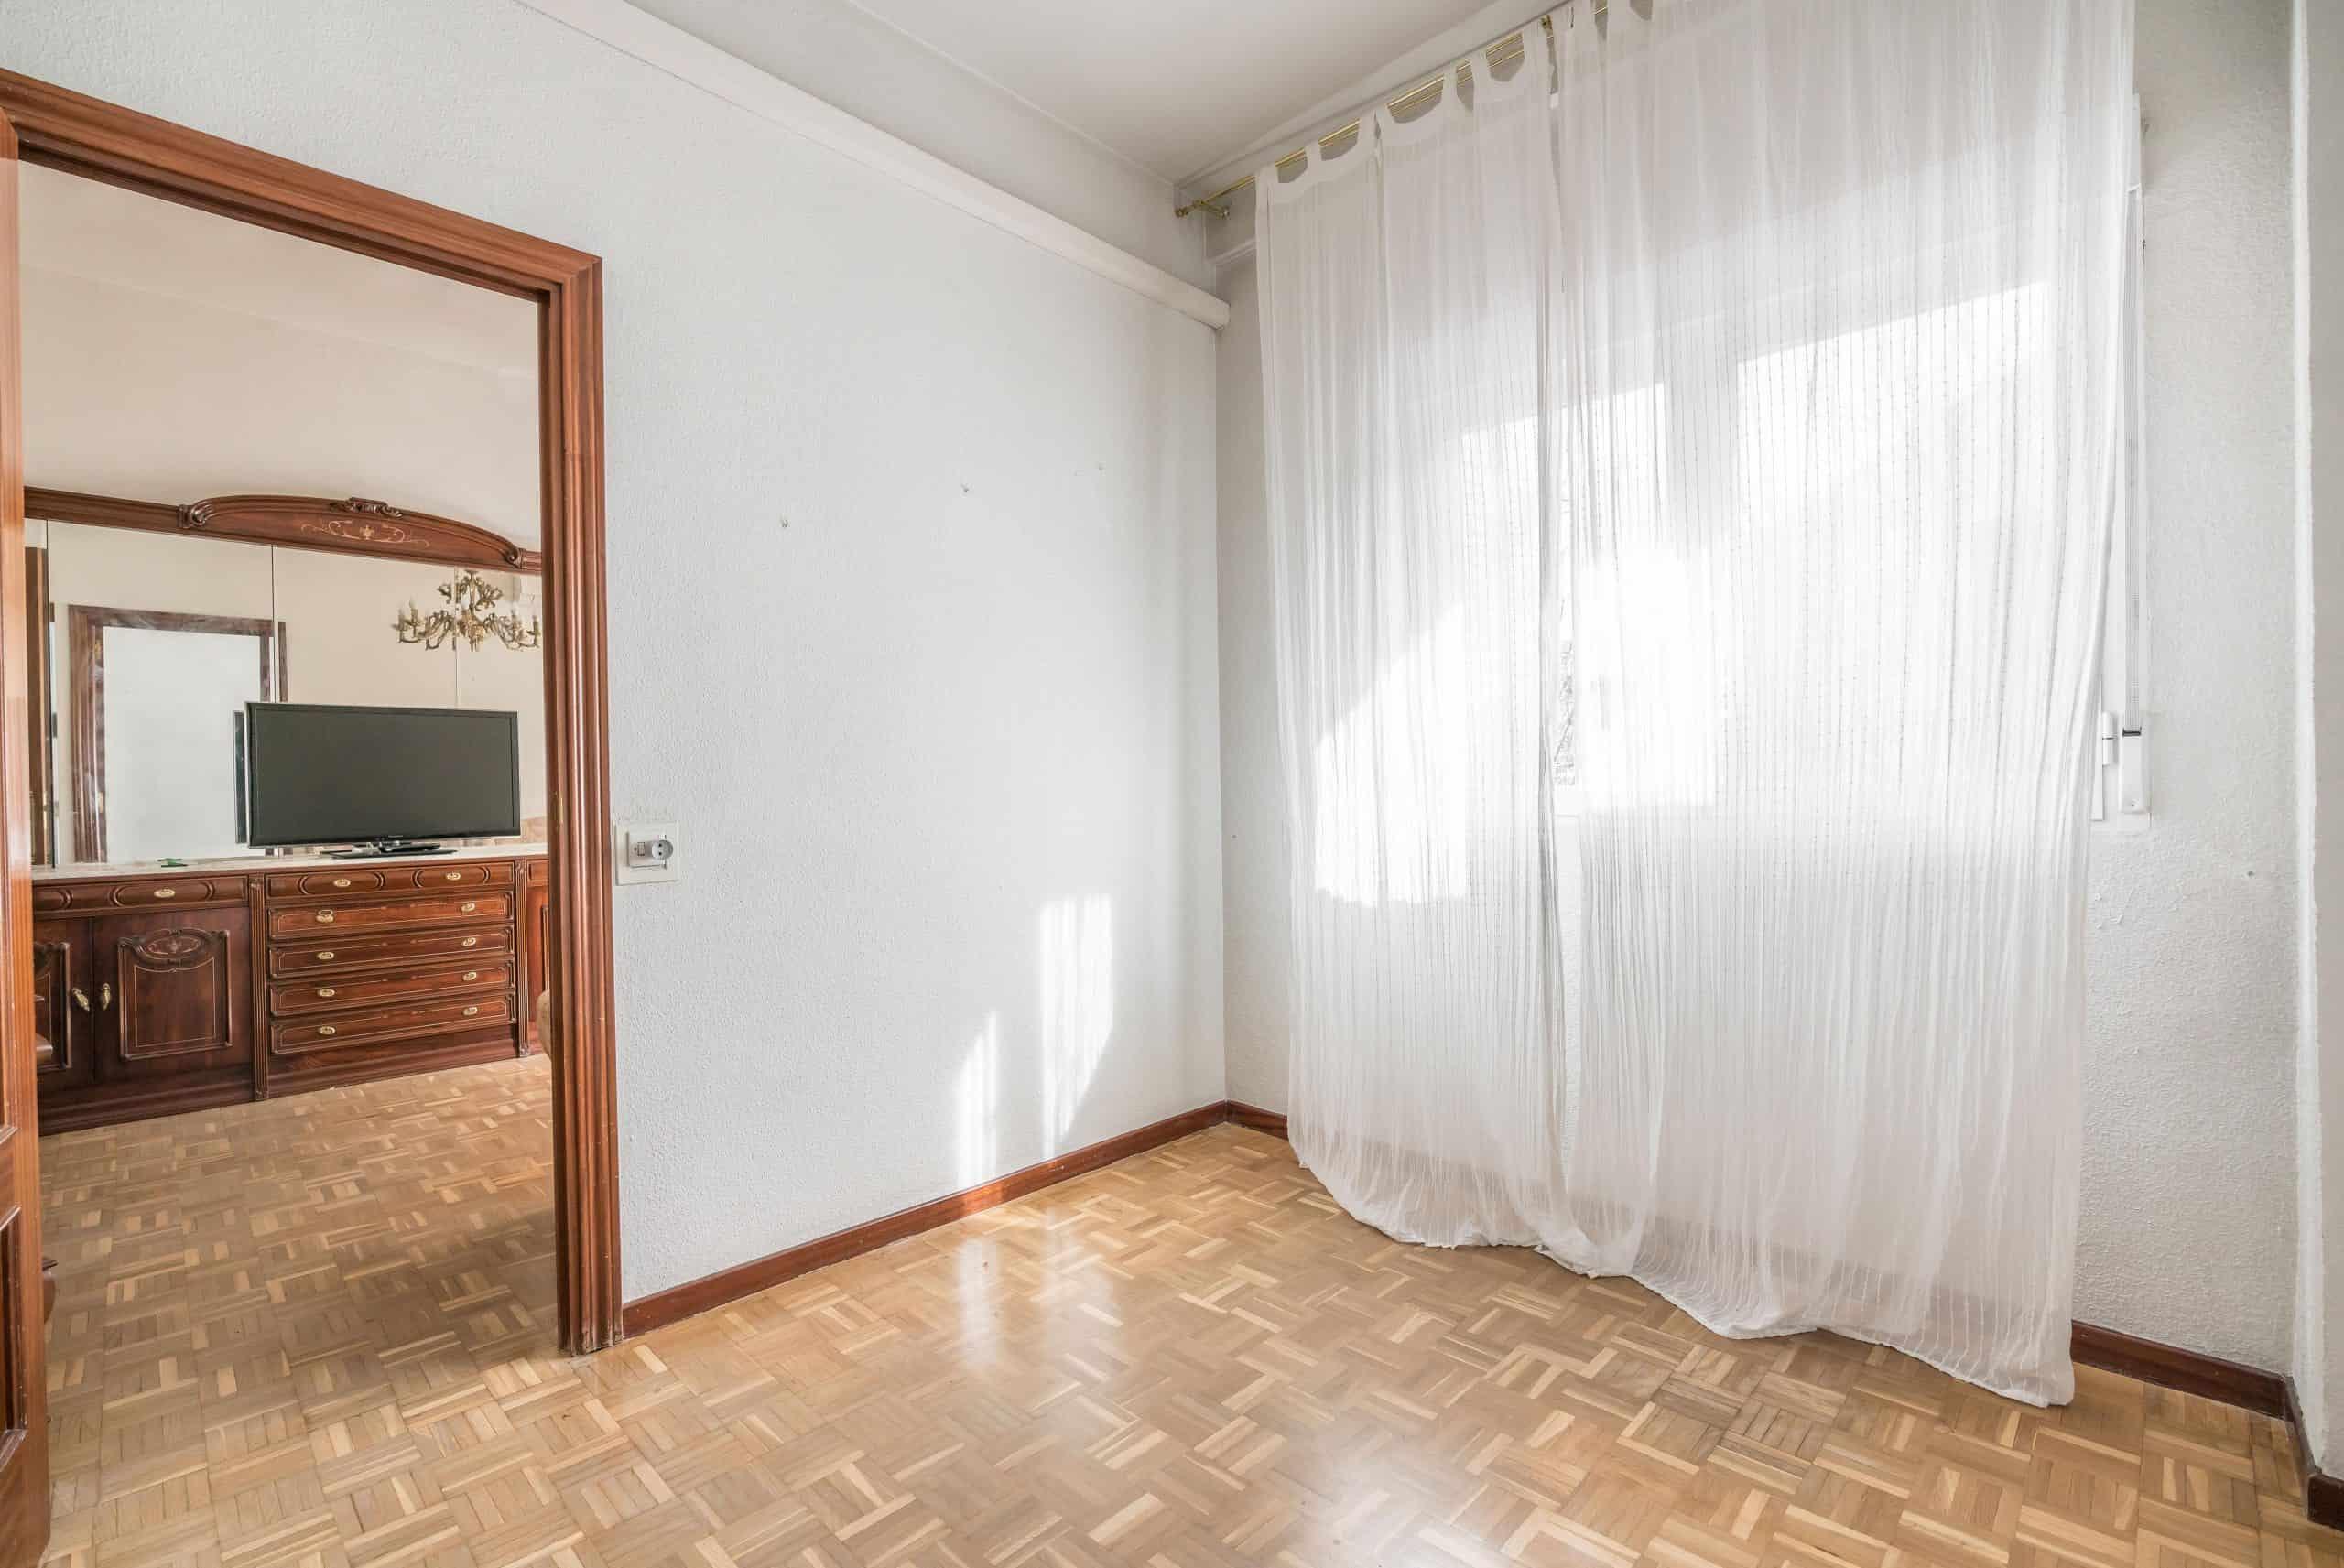 Agencia Inmobiliaria de Madrid-FUTUROCASA-Zona ARGANZUELA-LEGAZPI -calle Jaime Conquistador 48- 2do Dormitorio 2